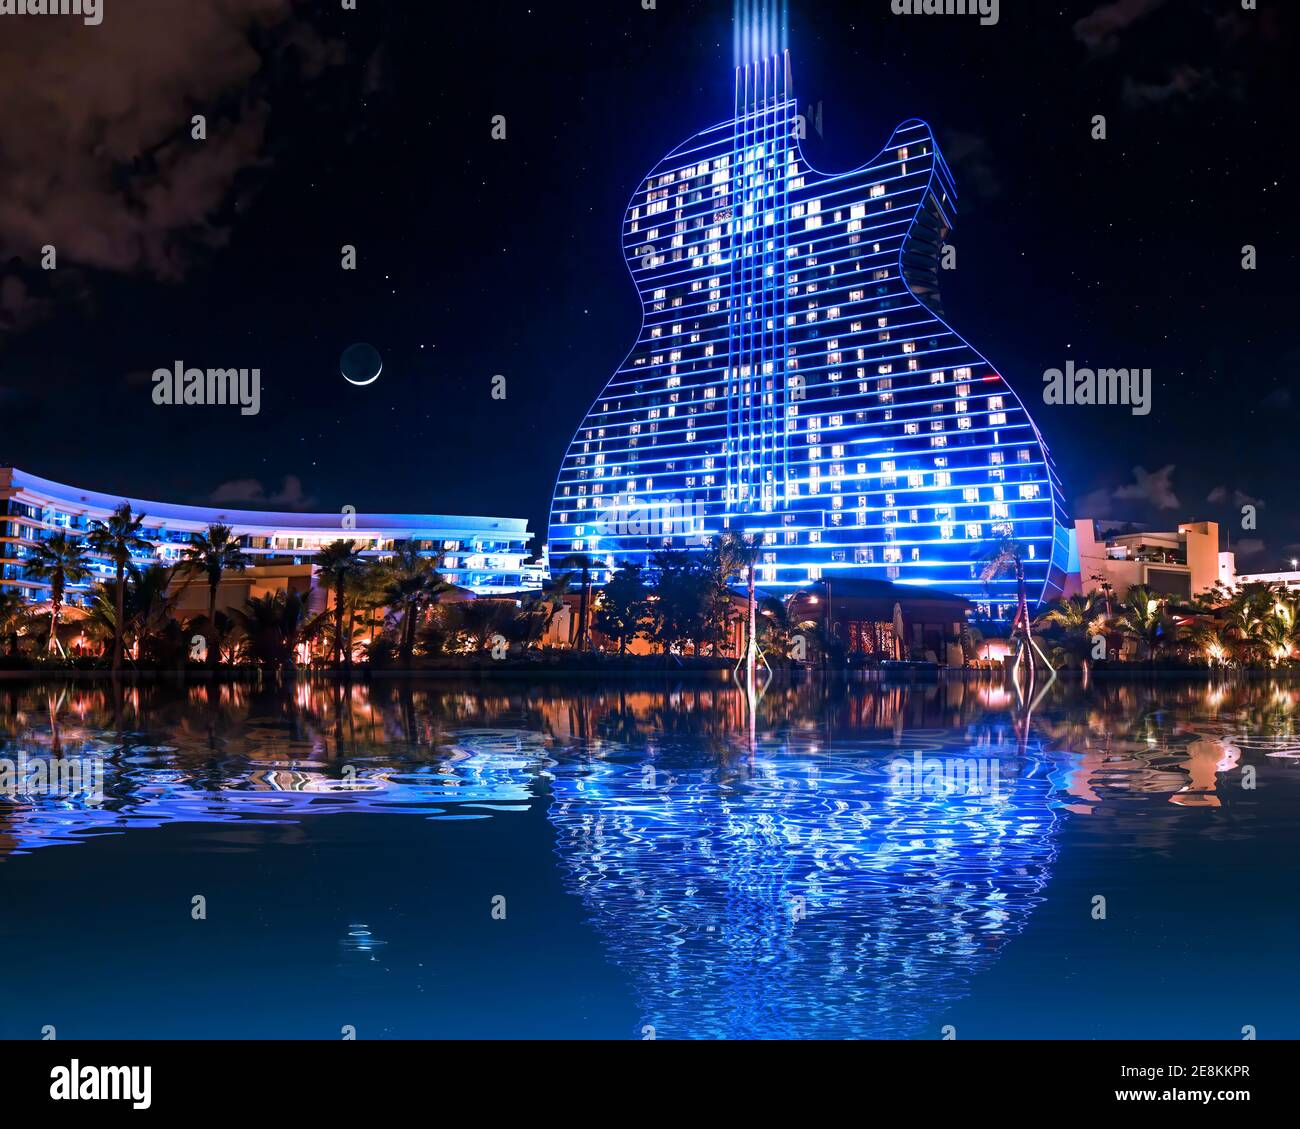 Crocodile rock casino address in hollywood florida game samurai 2 vengeance